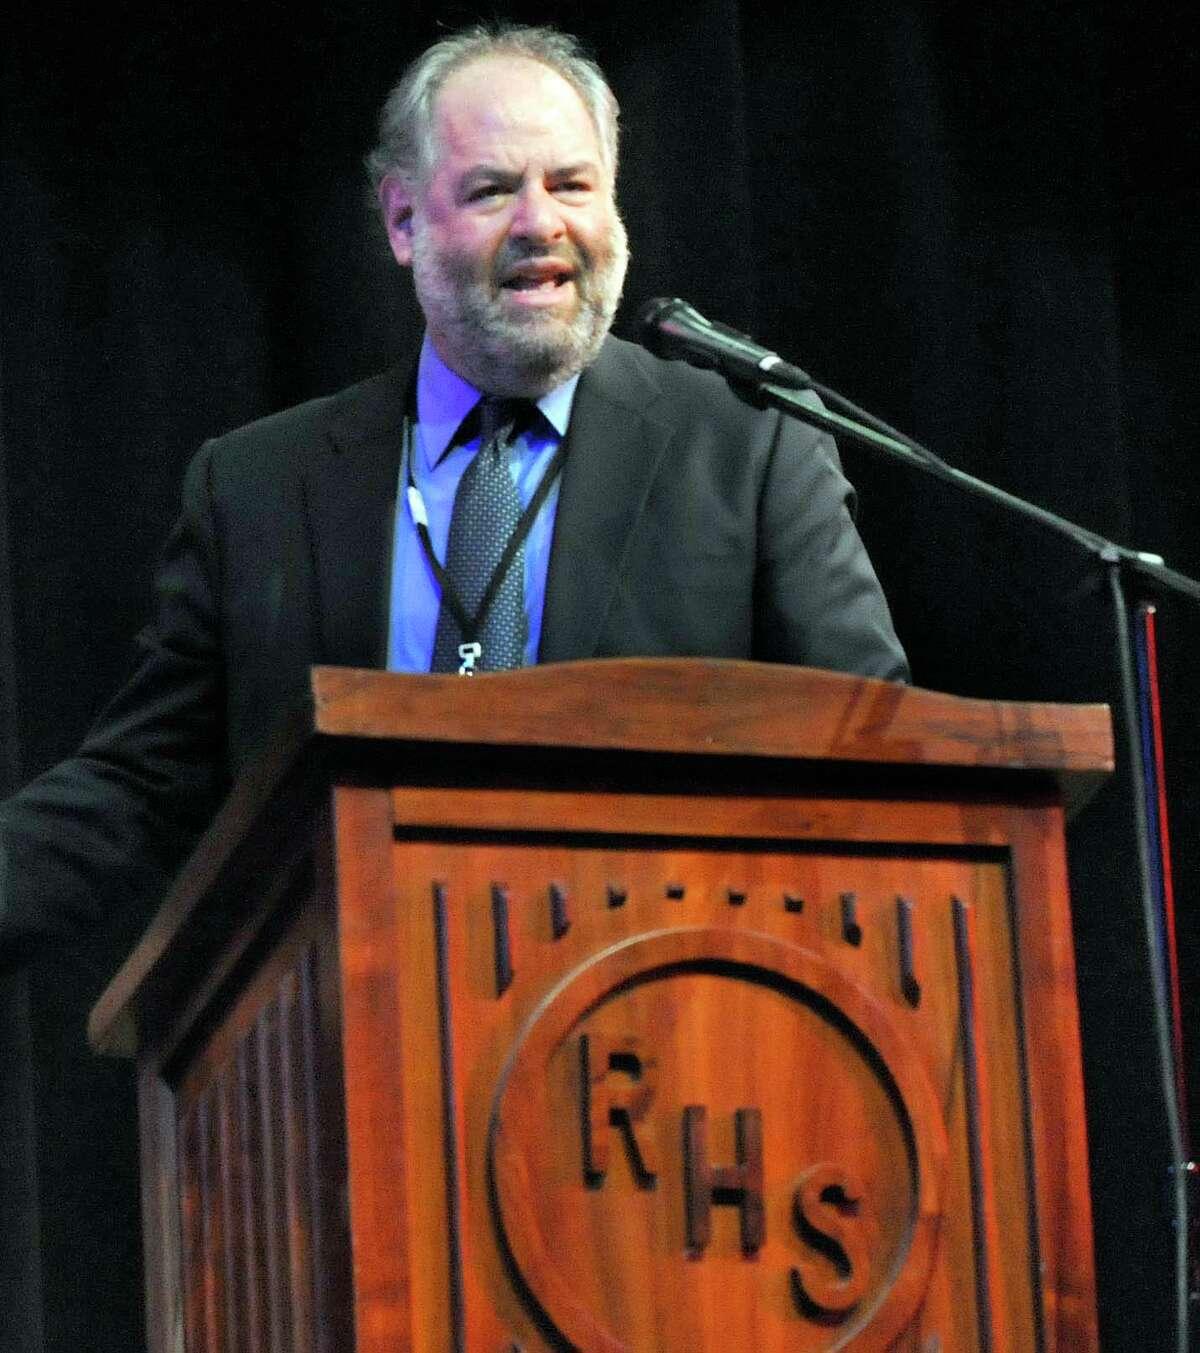 Principal Jeffrey Jaslow at Ridgefield High School Monday, Dec. 19, 2011.